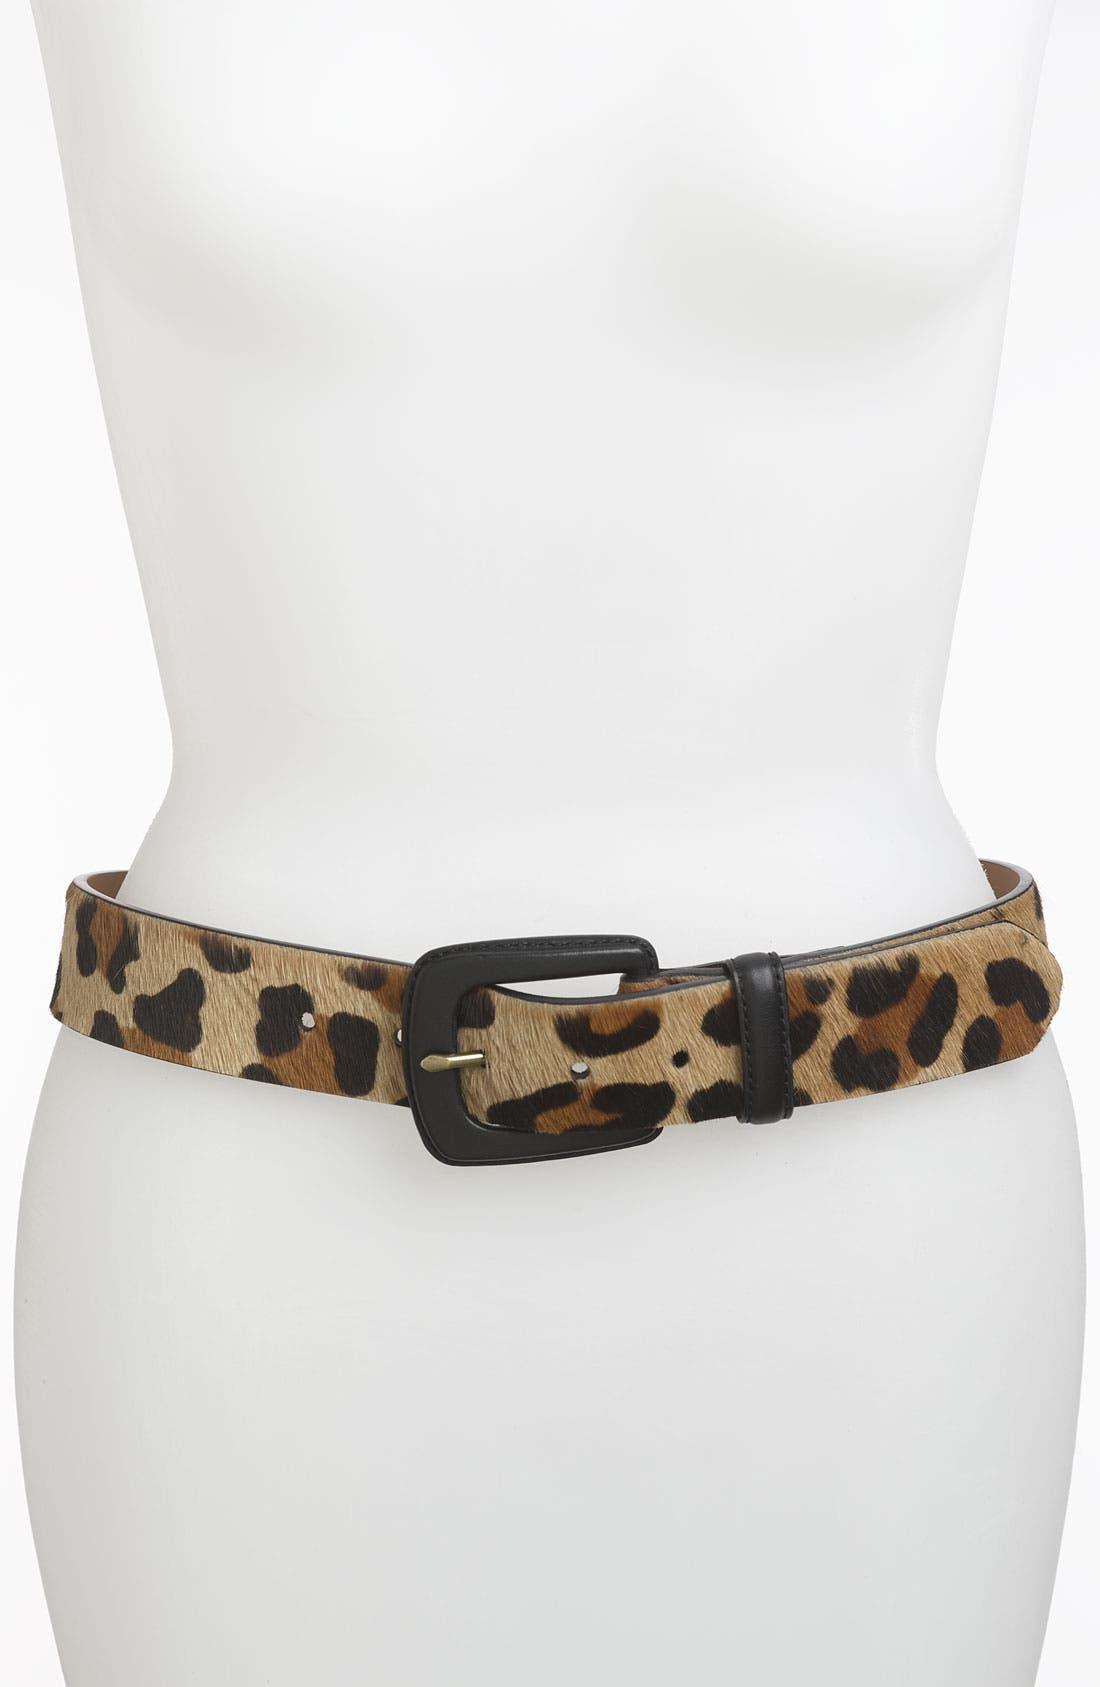 Alternate Image 1 Selected - Lauren Ralph Lauren Leopard Print Calf Hair Belt